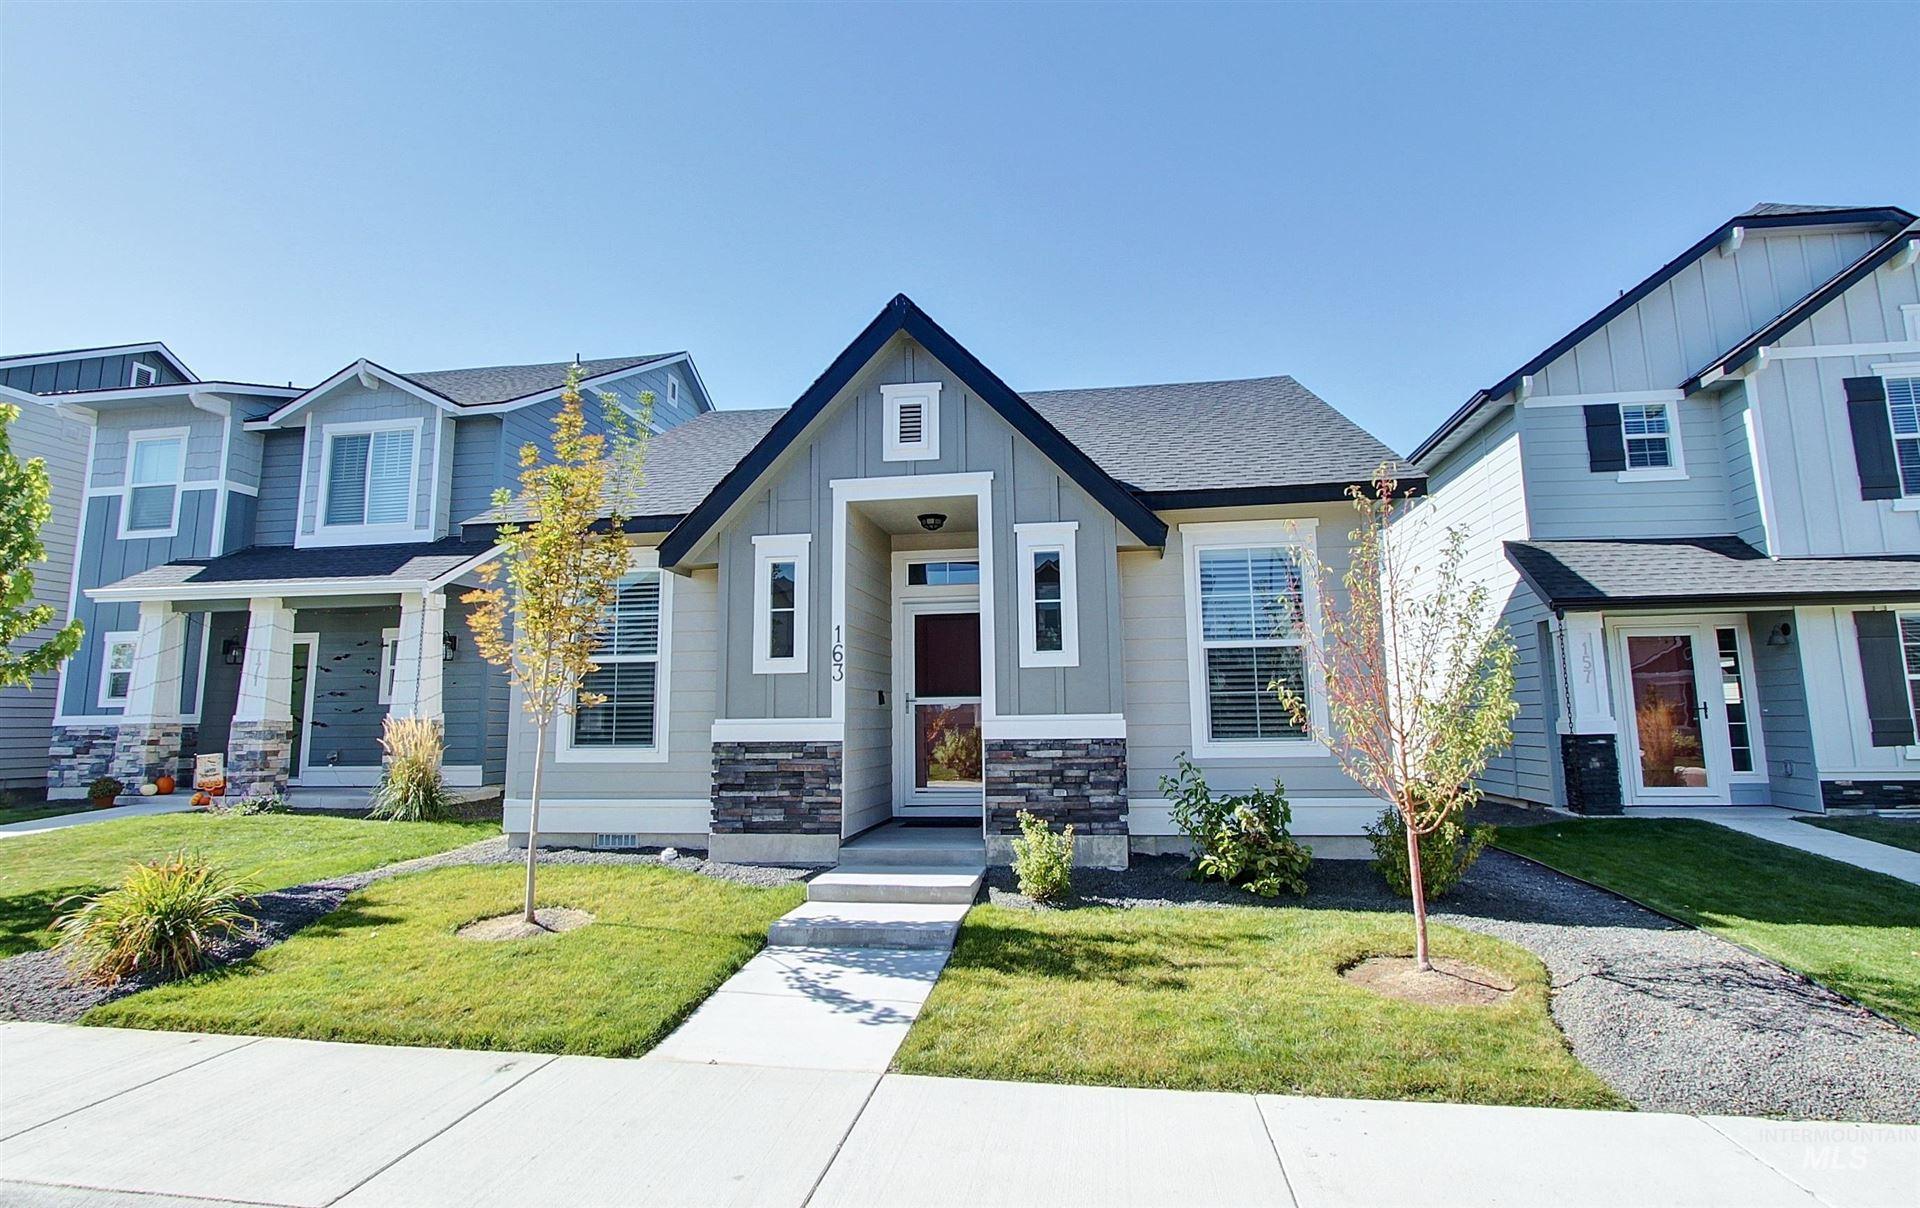 163 S Riggs Spring Ave, Meridian, ID 83642 - MLS#: 98820427